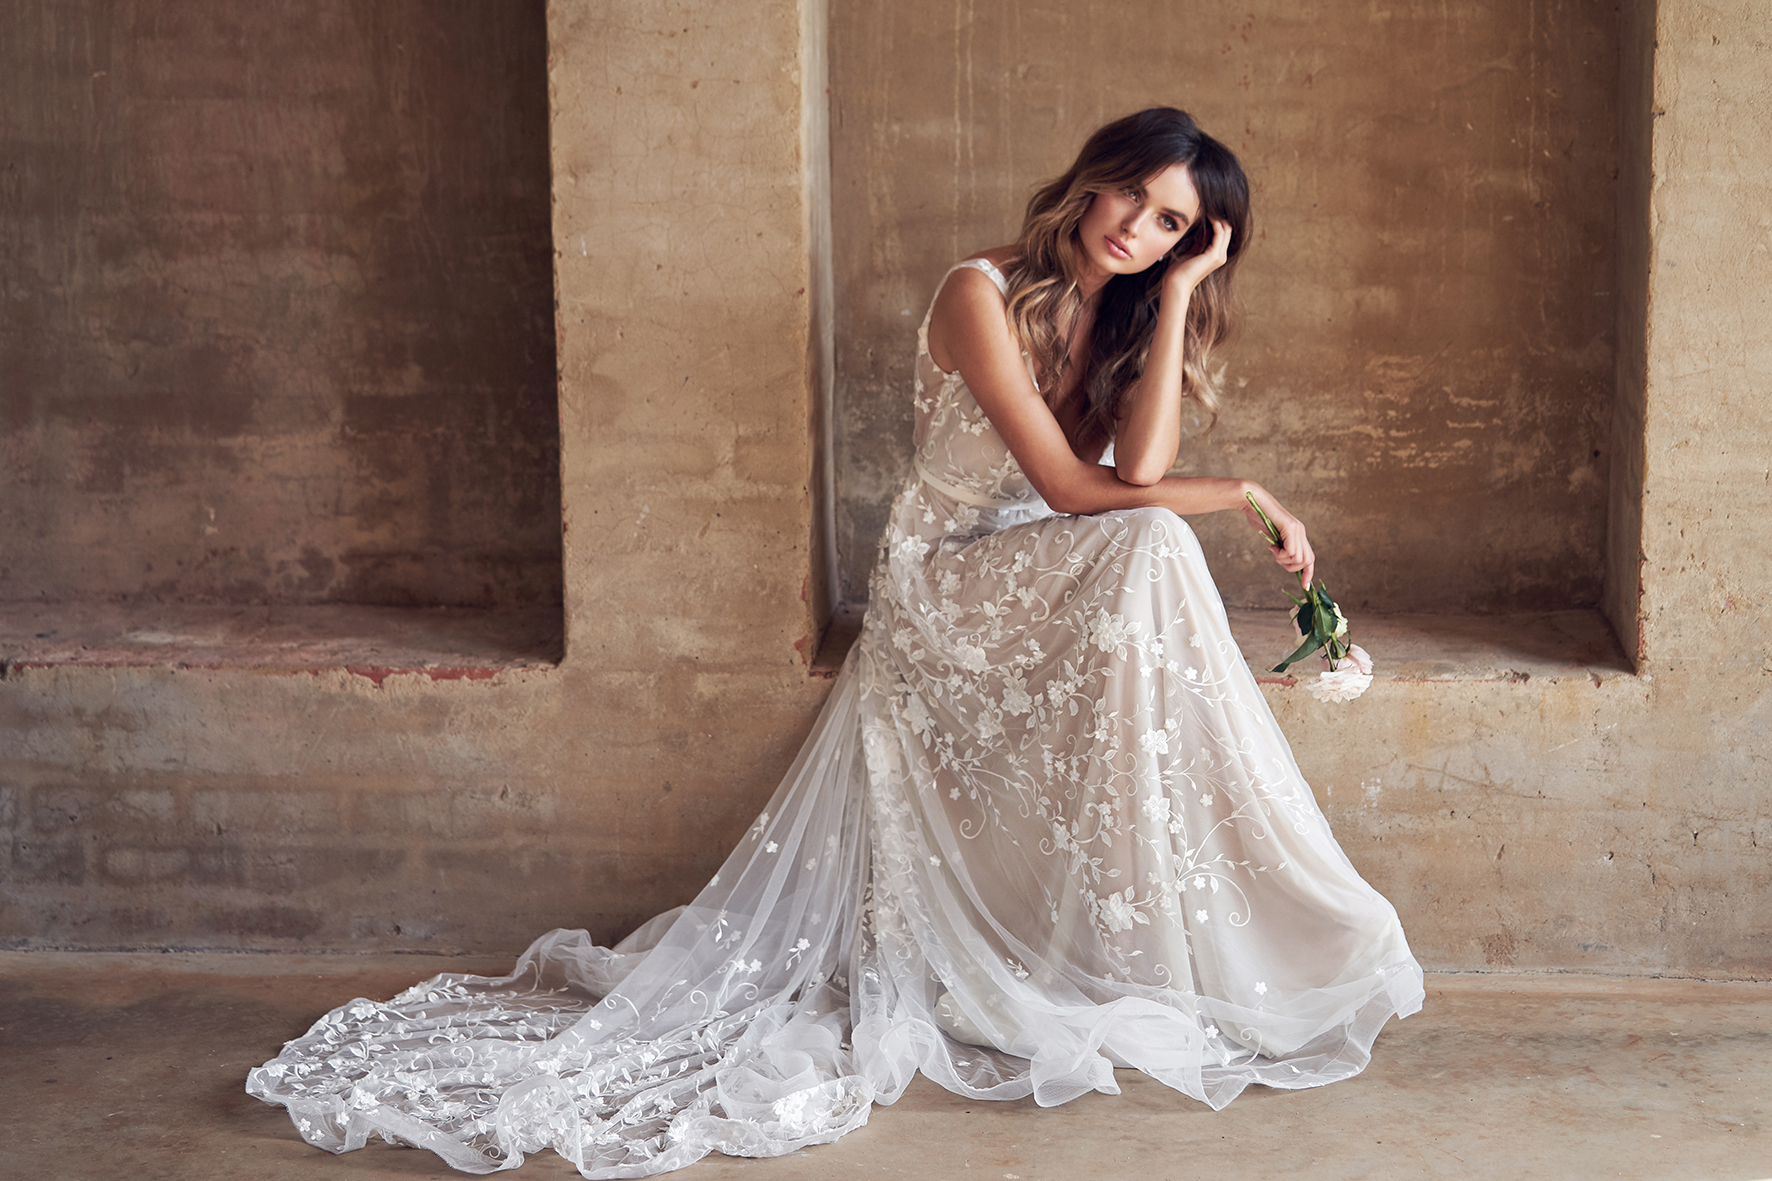 Anna Campbell | Amelie Dress | Wanderlust Collection